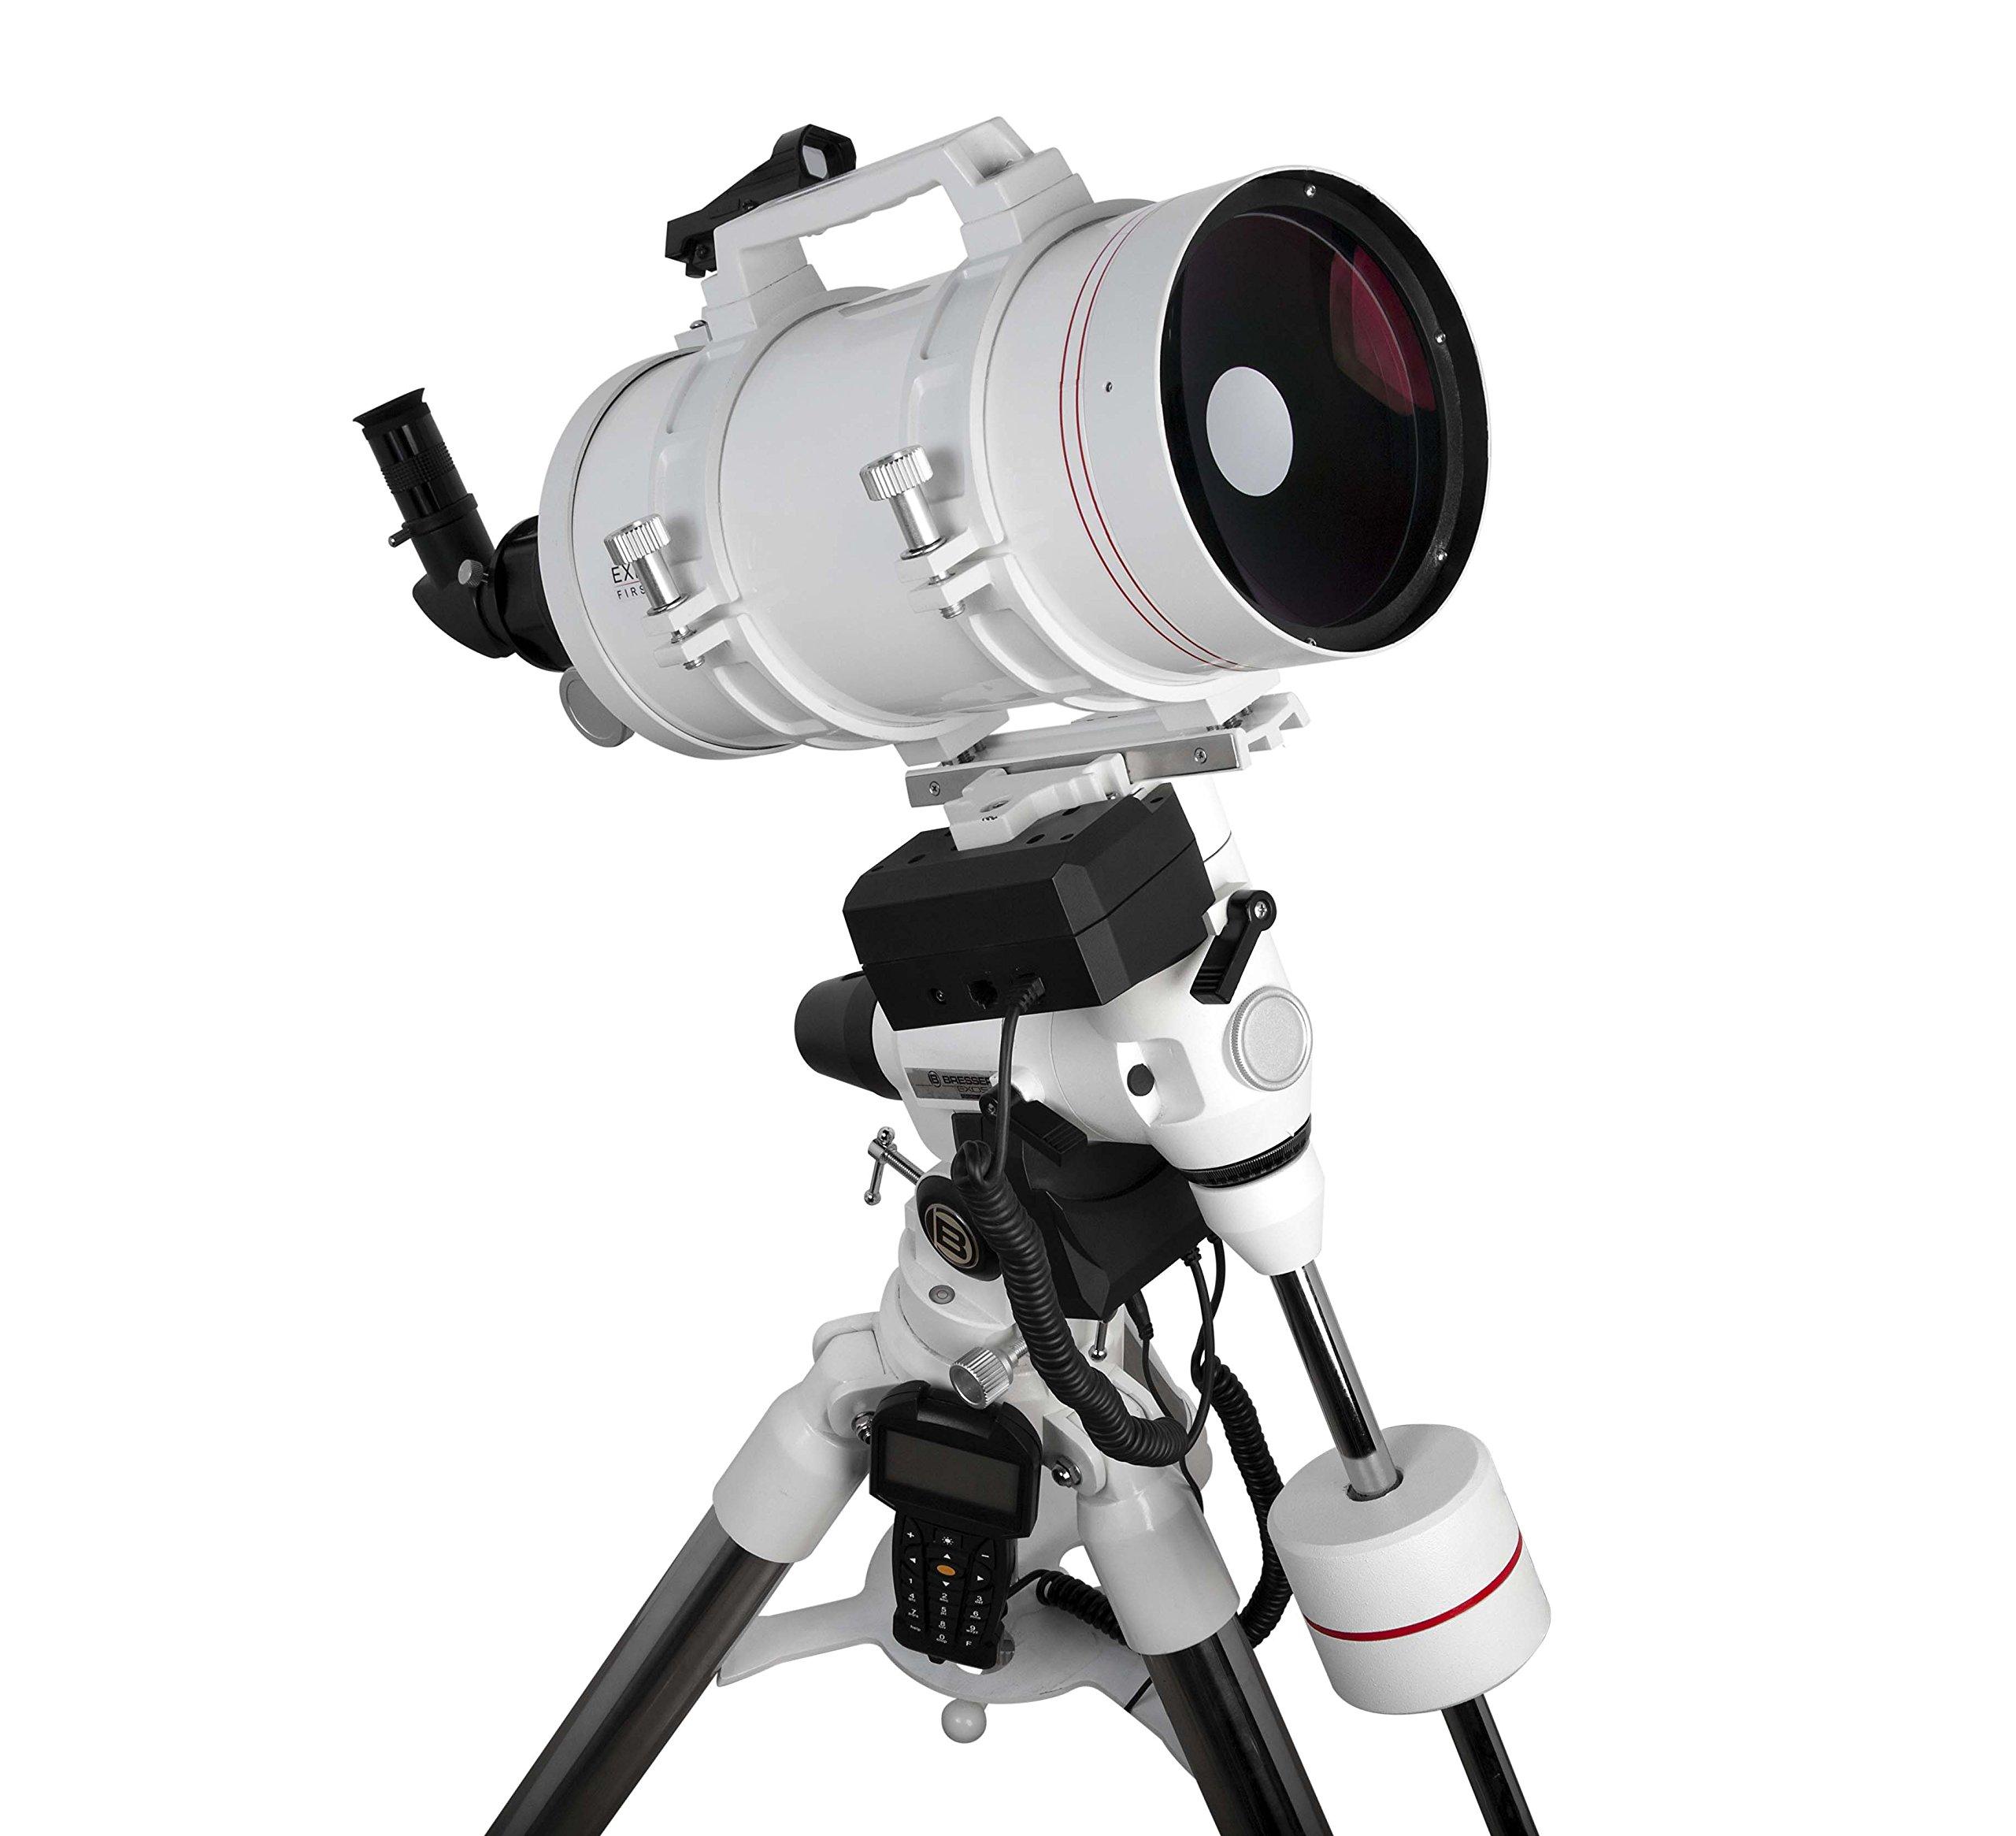 Explore Scientific FL-MC1521900EXOS2GT First Light Tube sutov-Cassegrain Telescope with Exos-2 Mount with Goto, 152mm, White by Explore Scientific